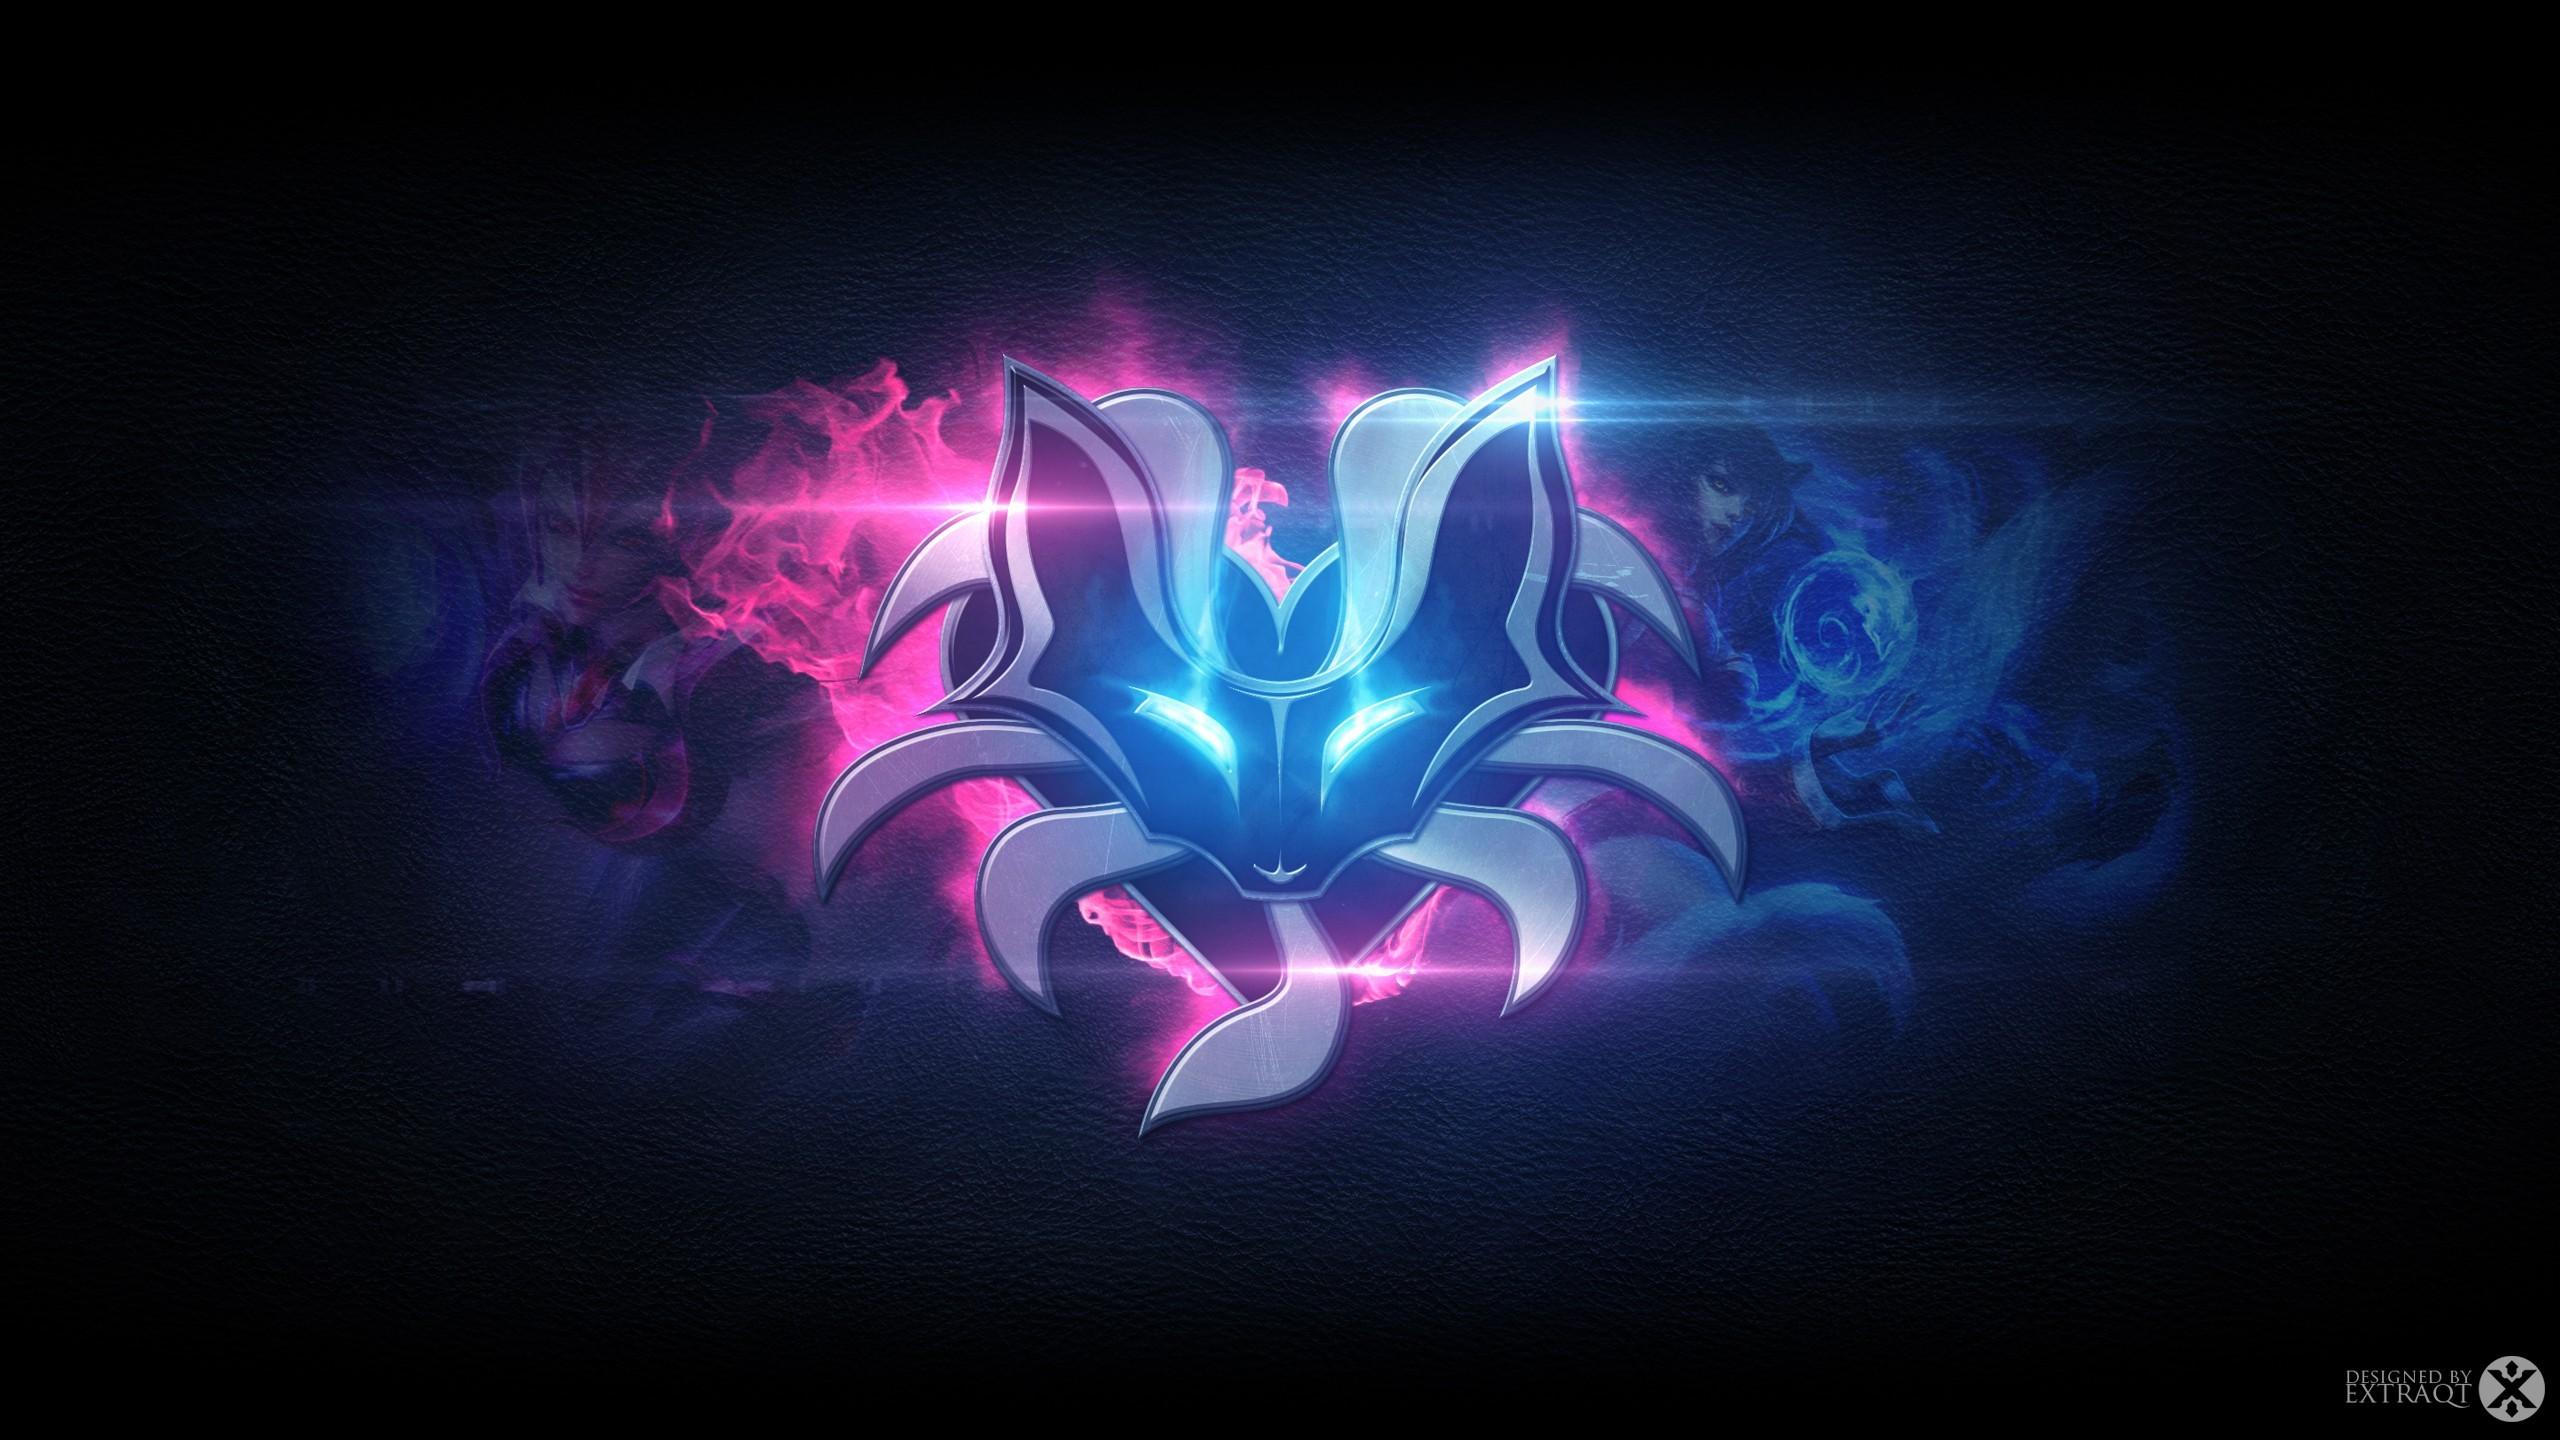 League Of Legends Ahri Wallpaper - Wolf Youtube Channel Art , HD Wallpaper & Backgrounds